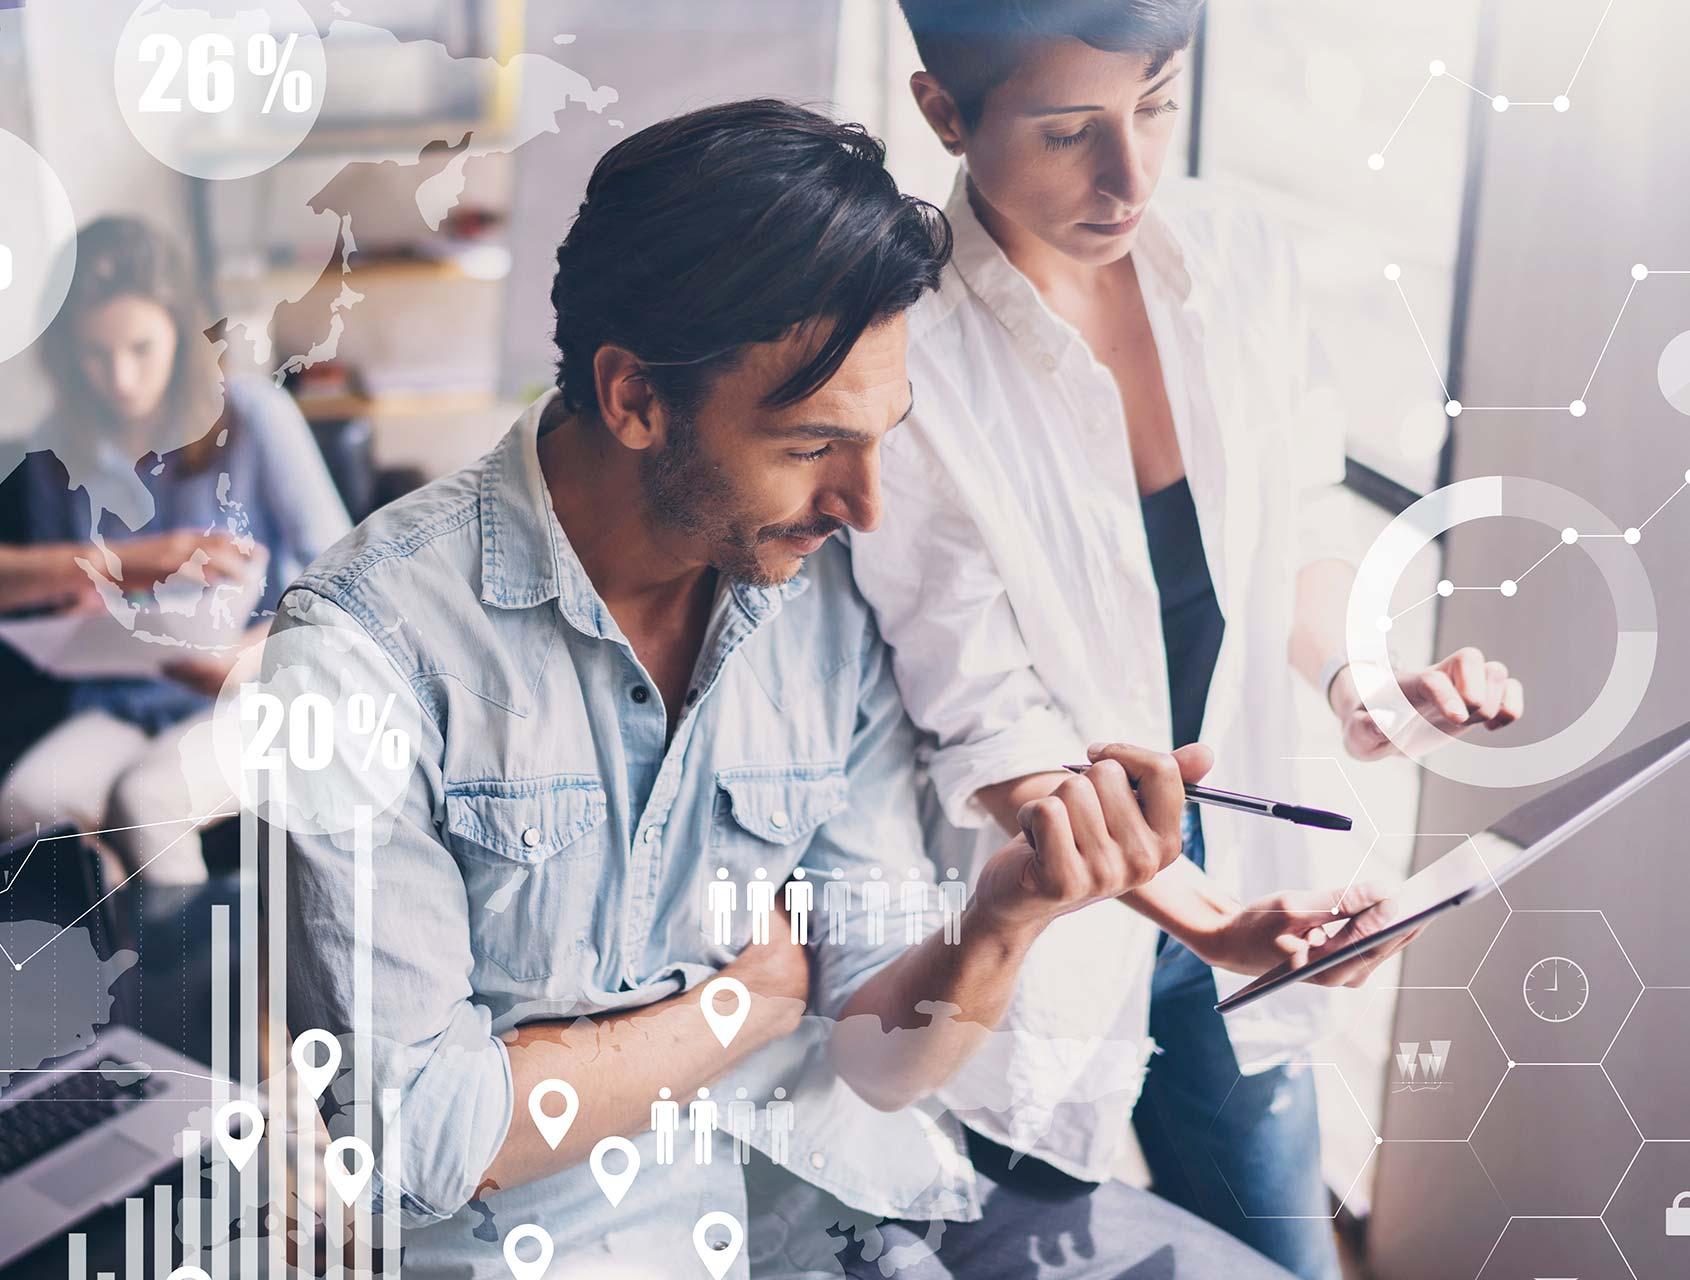 marketing digitale integratori, marketing digitale cosmesi bio